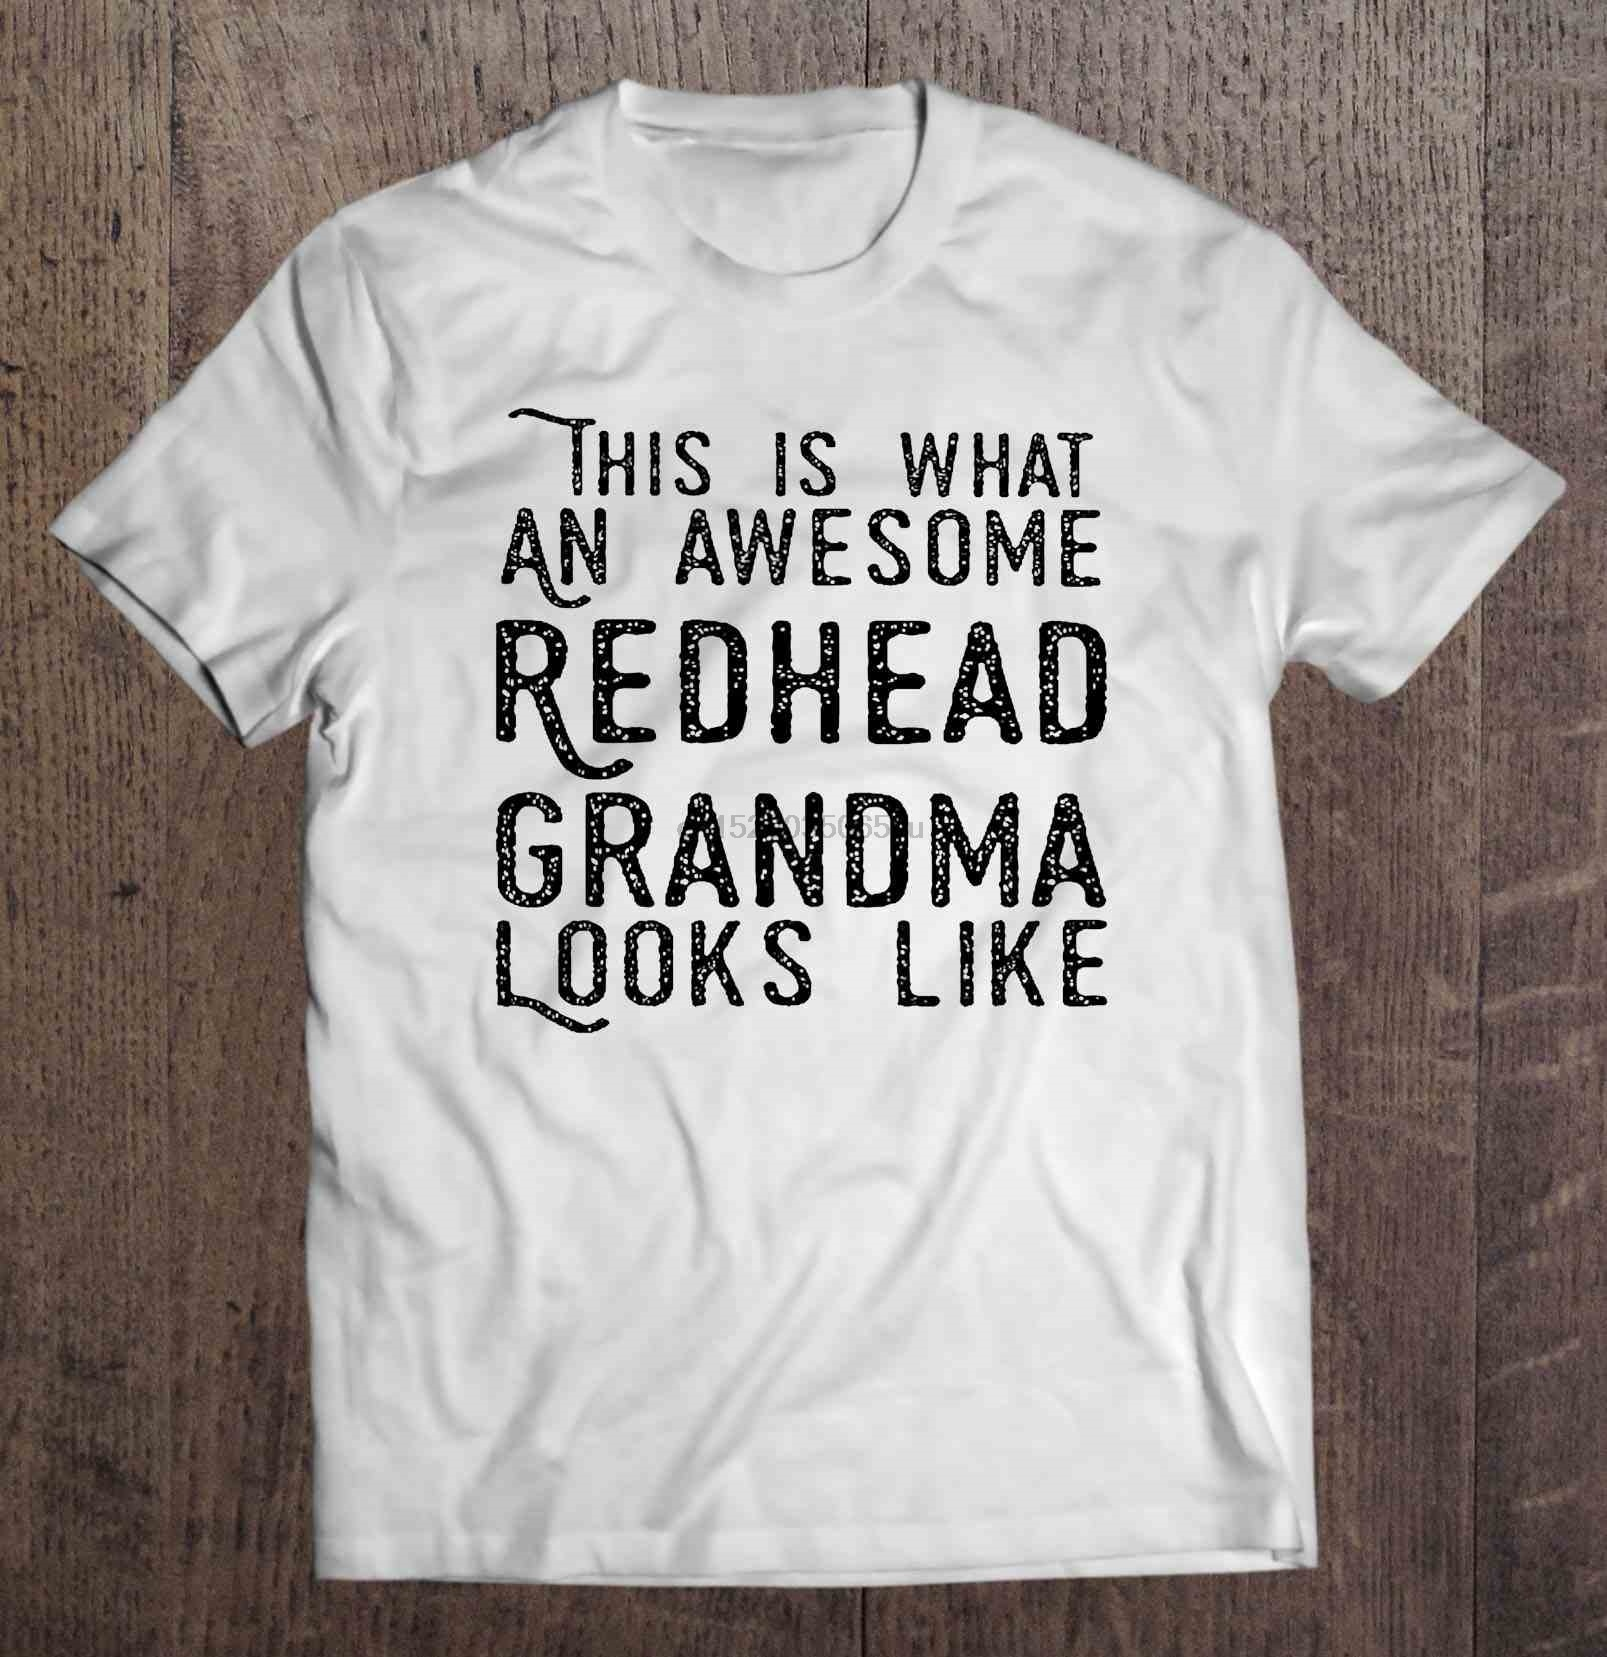 Men T Shirt  This Is What An Awesome Redhead Grandma Looks Like  Women t-shirt